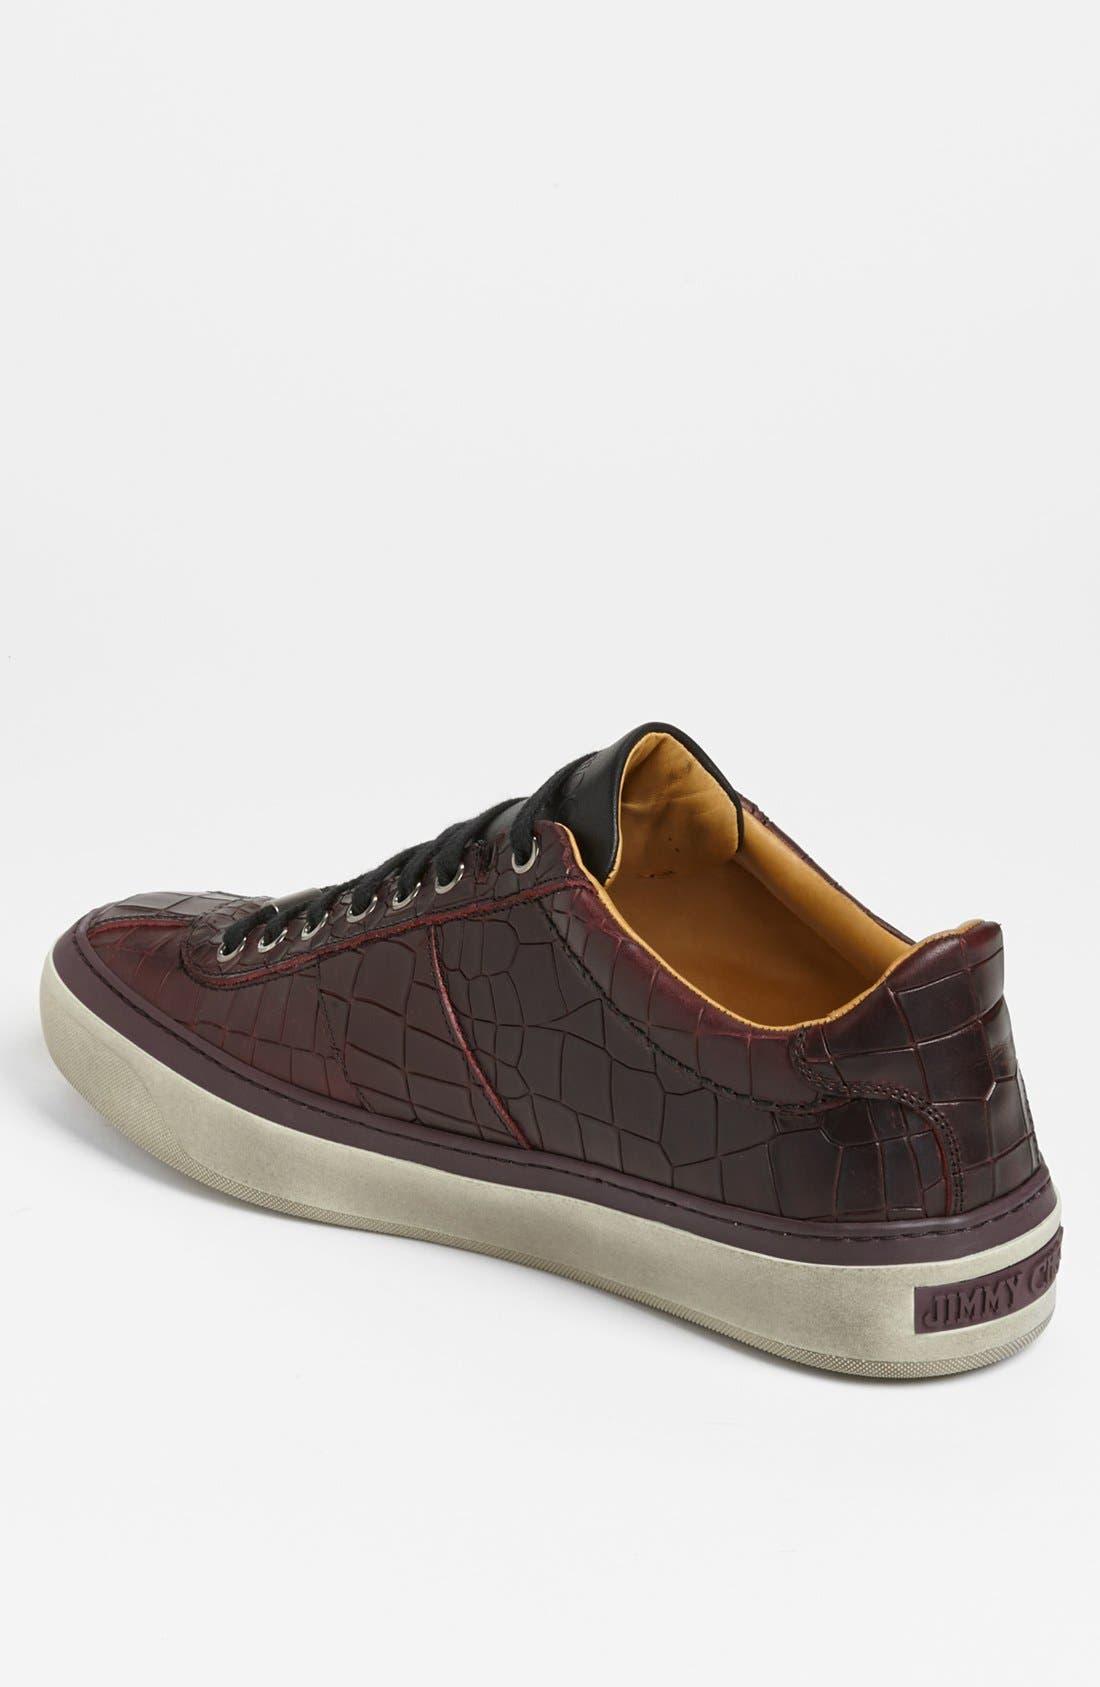 Alternate Image 2  - Jimmy Choo 'Portman' Sneaker